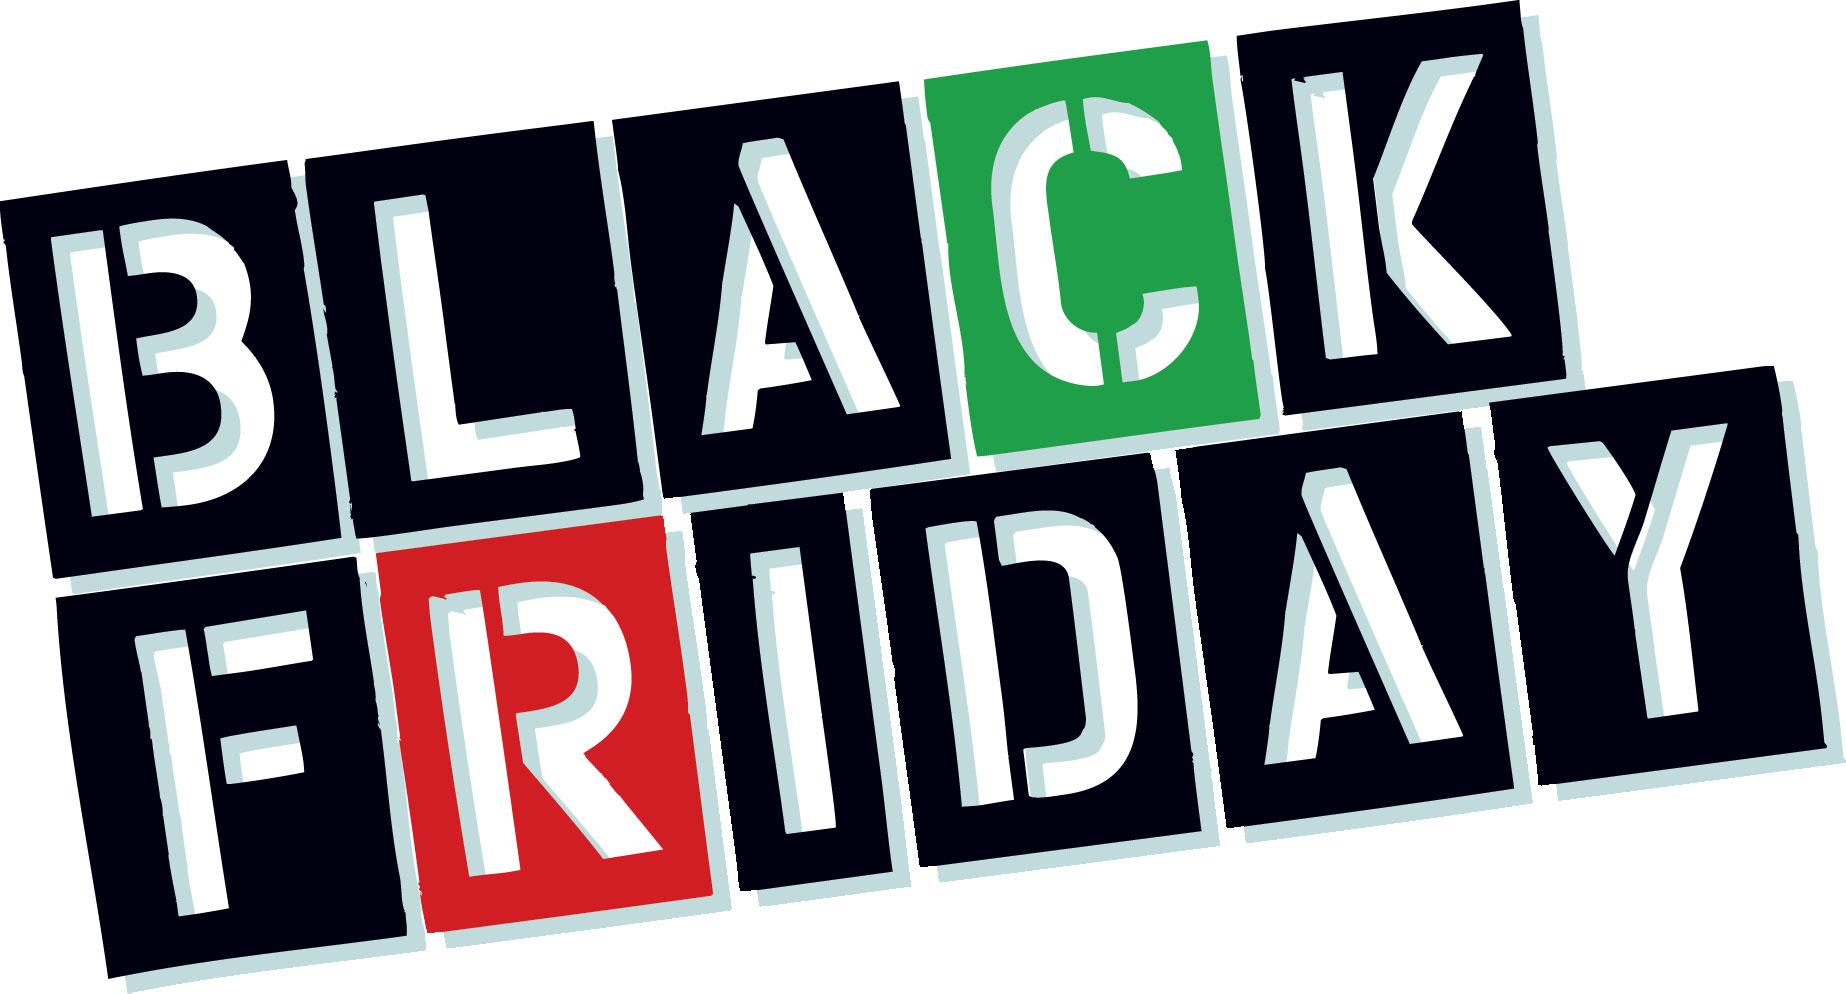 Black Friday- Черная Пятница